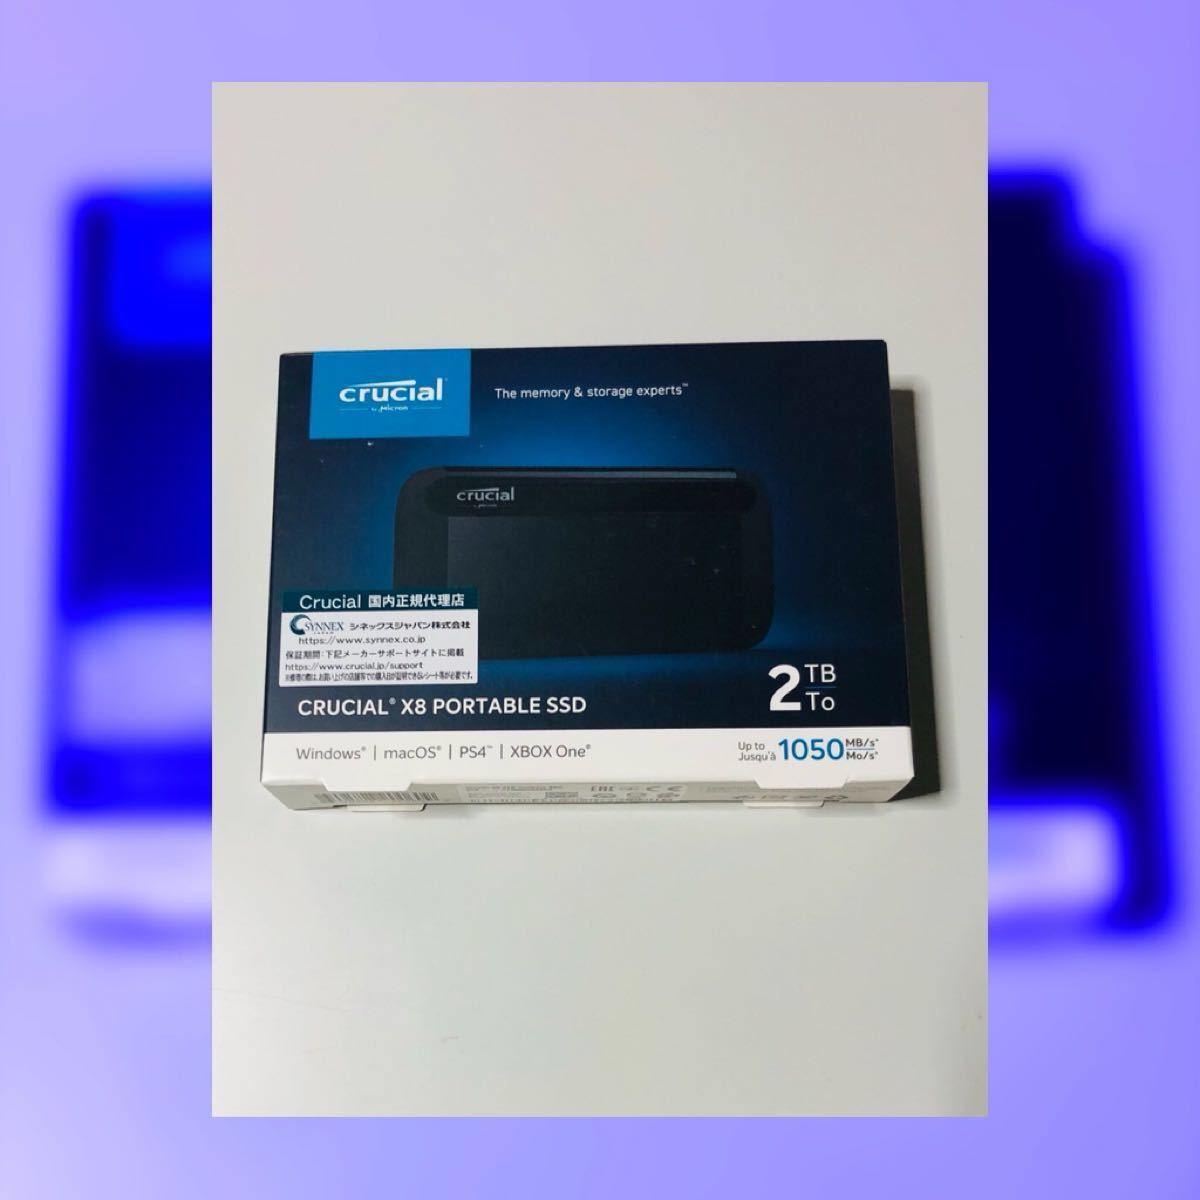 CT2000X8SSD9 [Crucial X8 Portable SSD 2TB]